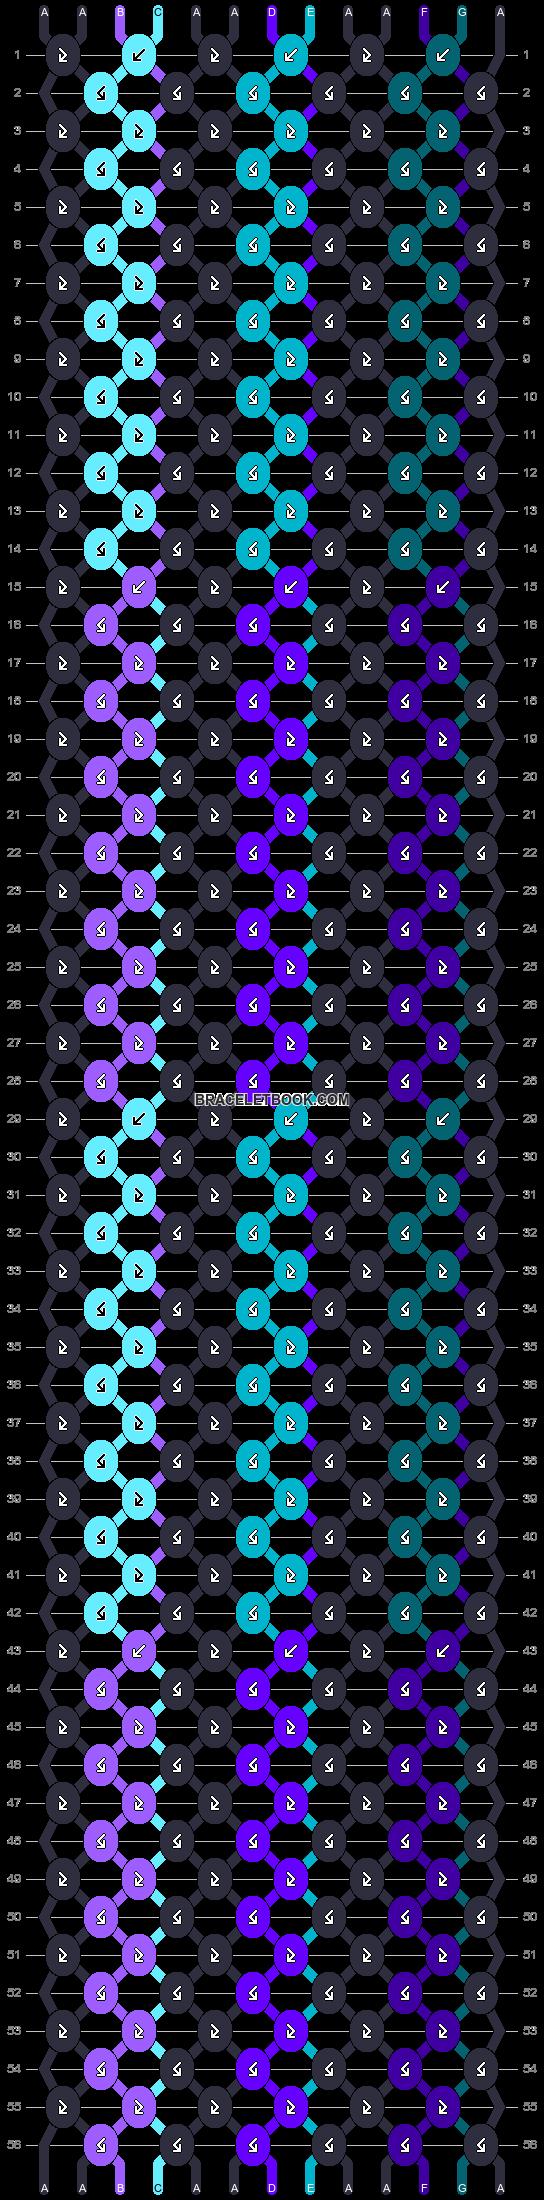 Normal pattern #17813 variation #900 pattern